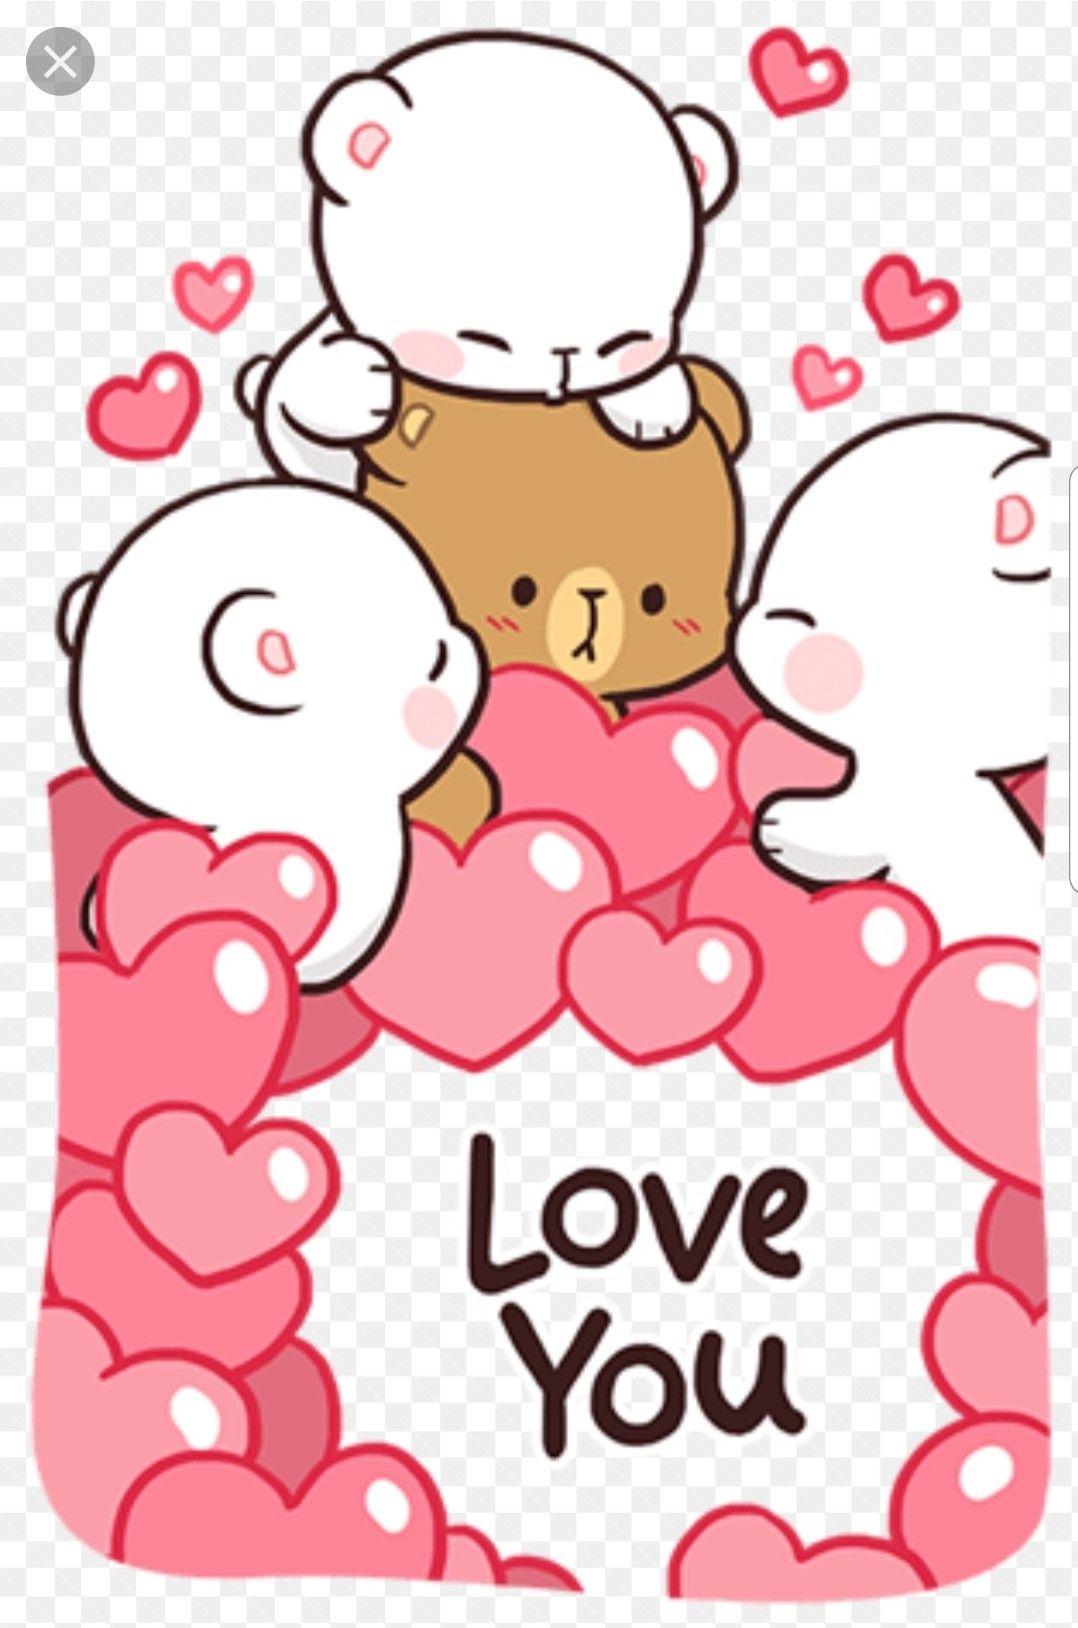 Milk Mocha Bear Mobile Wallpapers - Wallpaper Cave